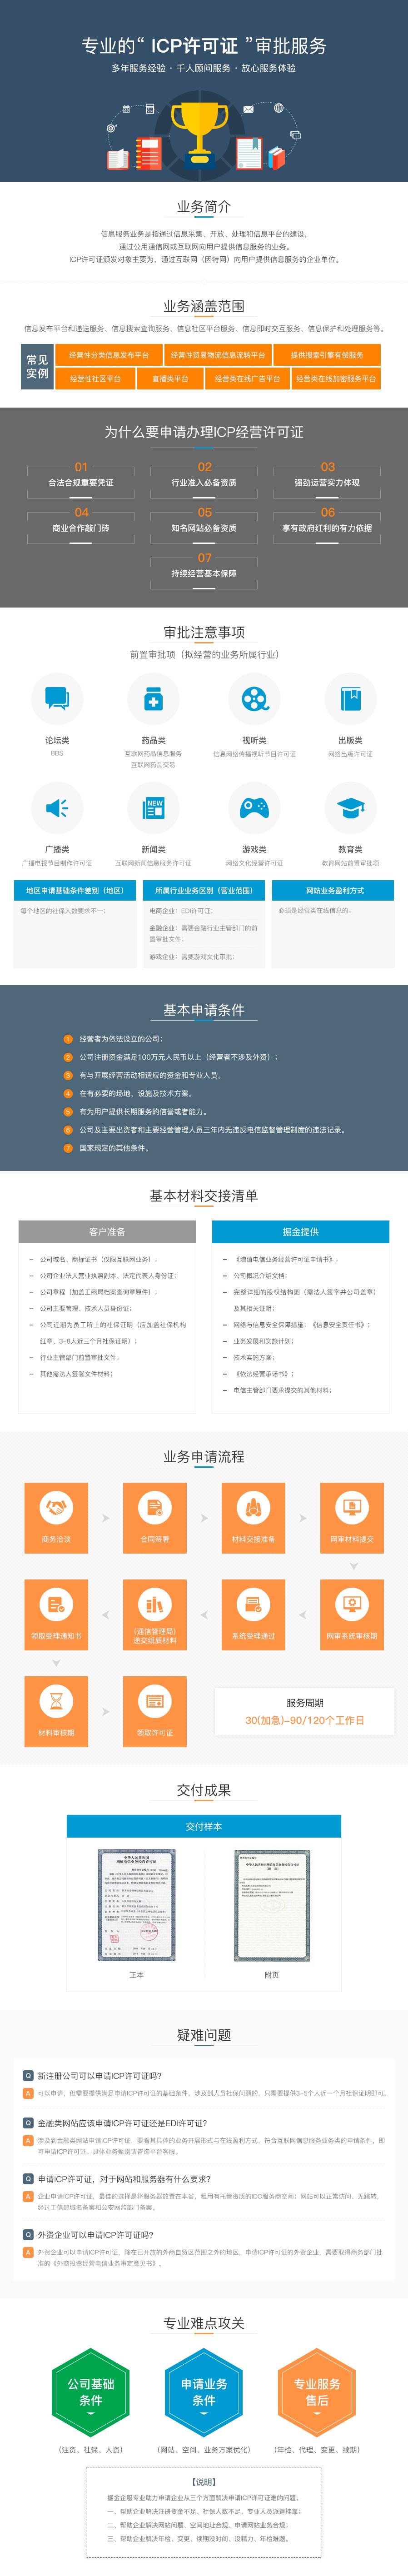 ICP许可证办理资料,ICP许可证办理流程